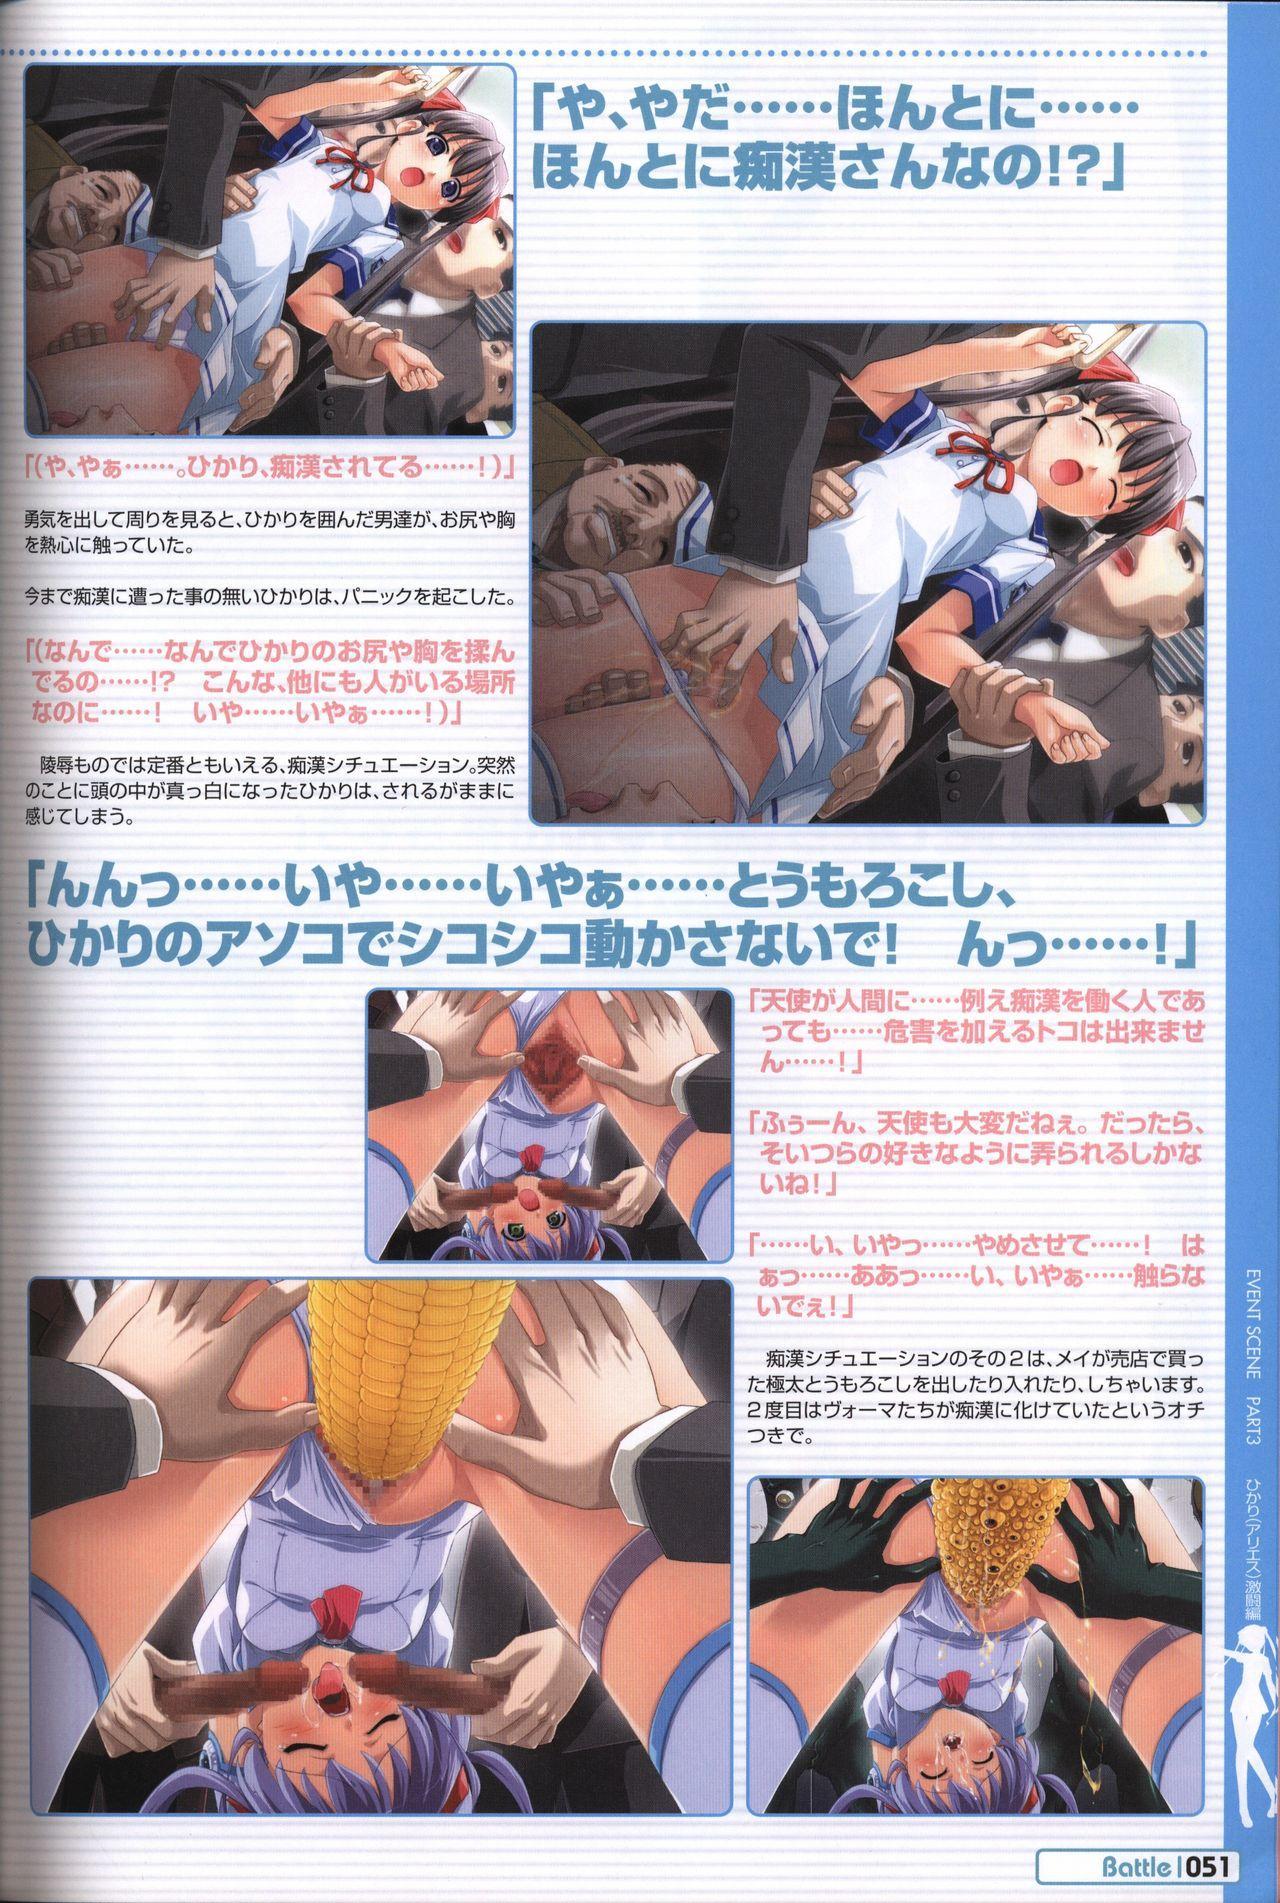 Makai Tenshi Jibril~EPISODE 2~ official fanbook 48